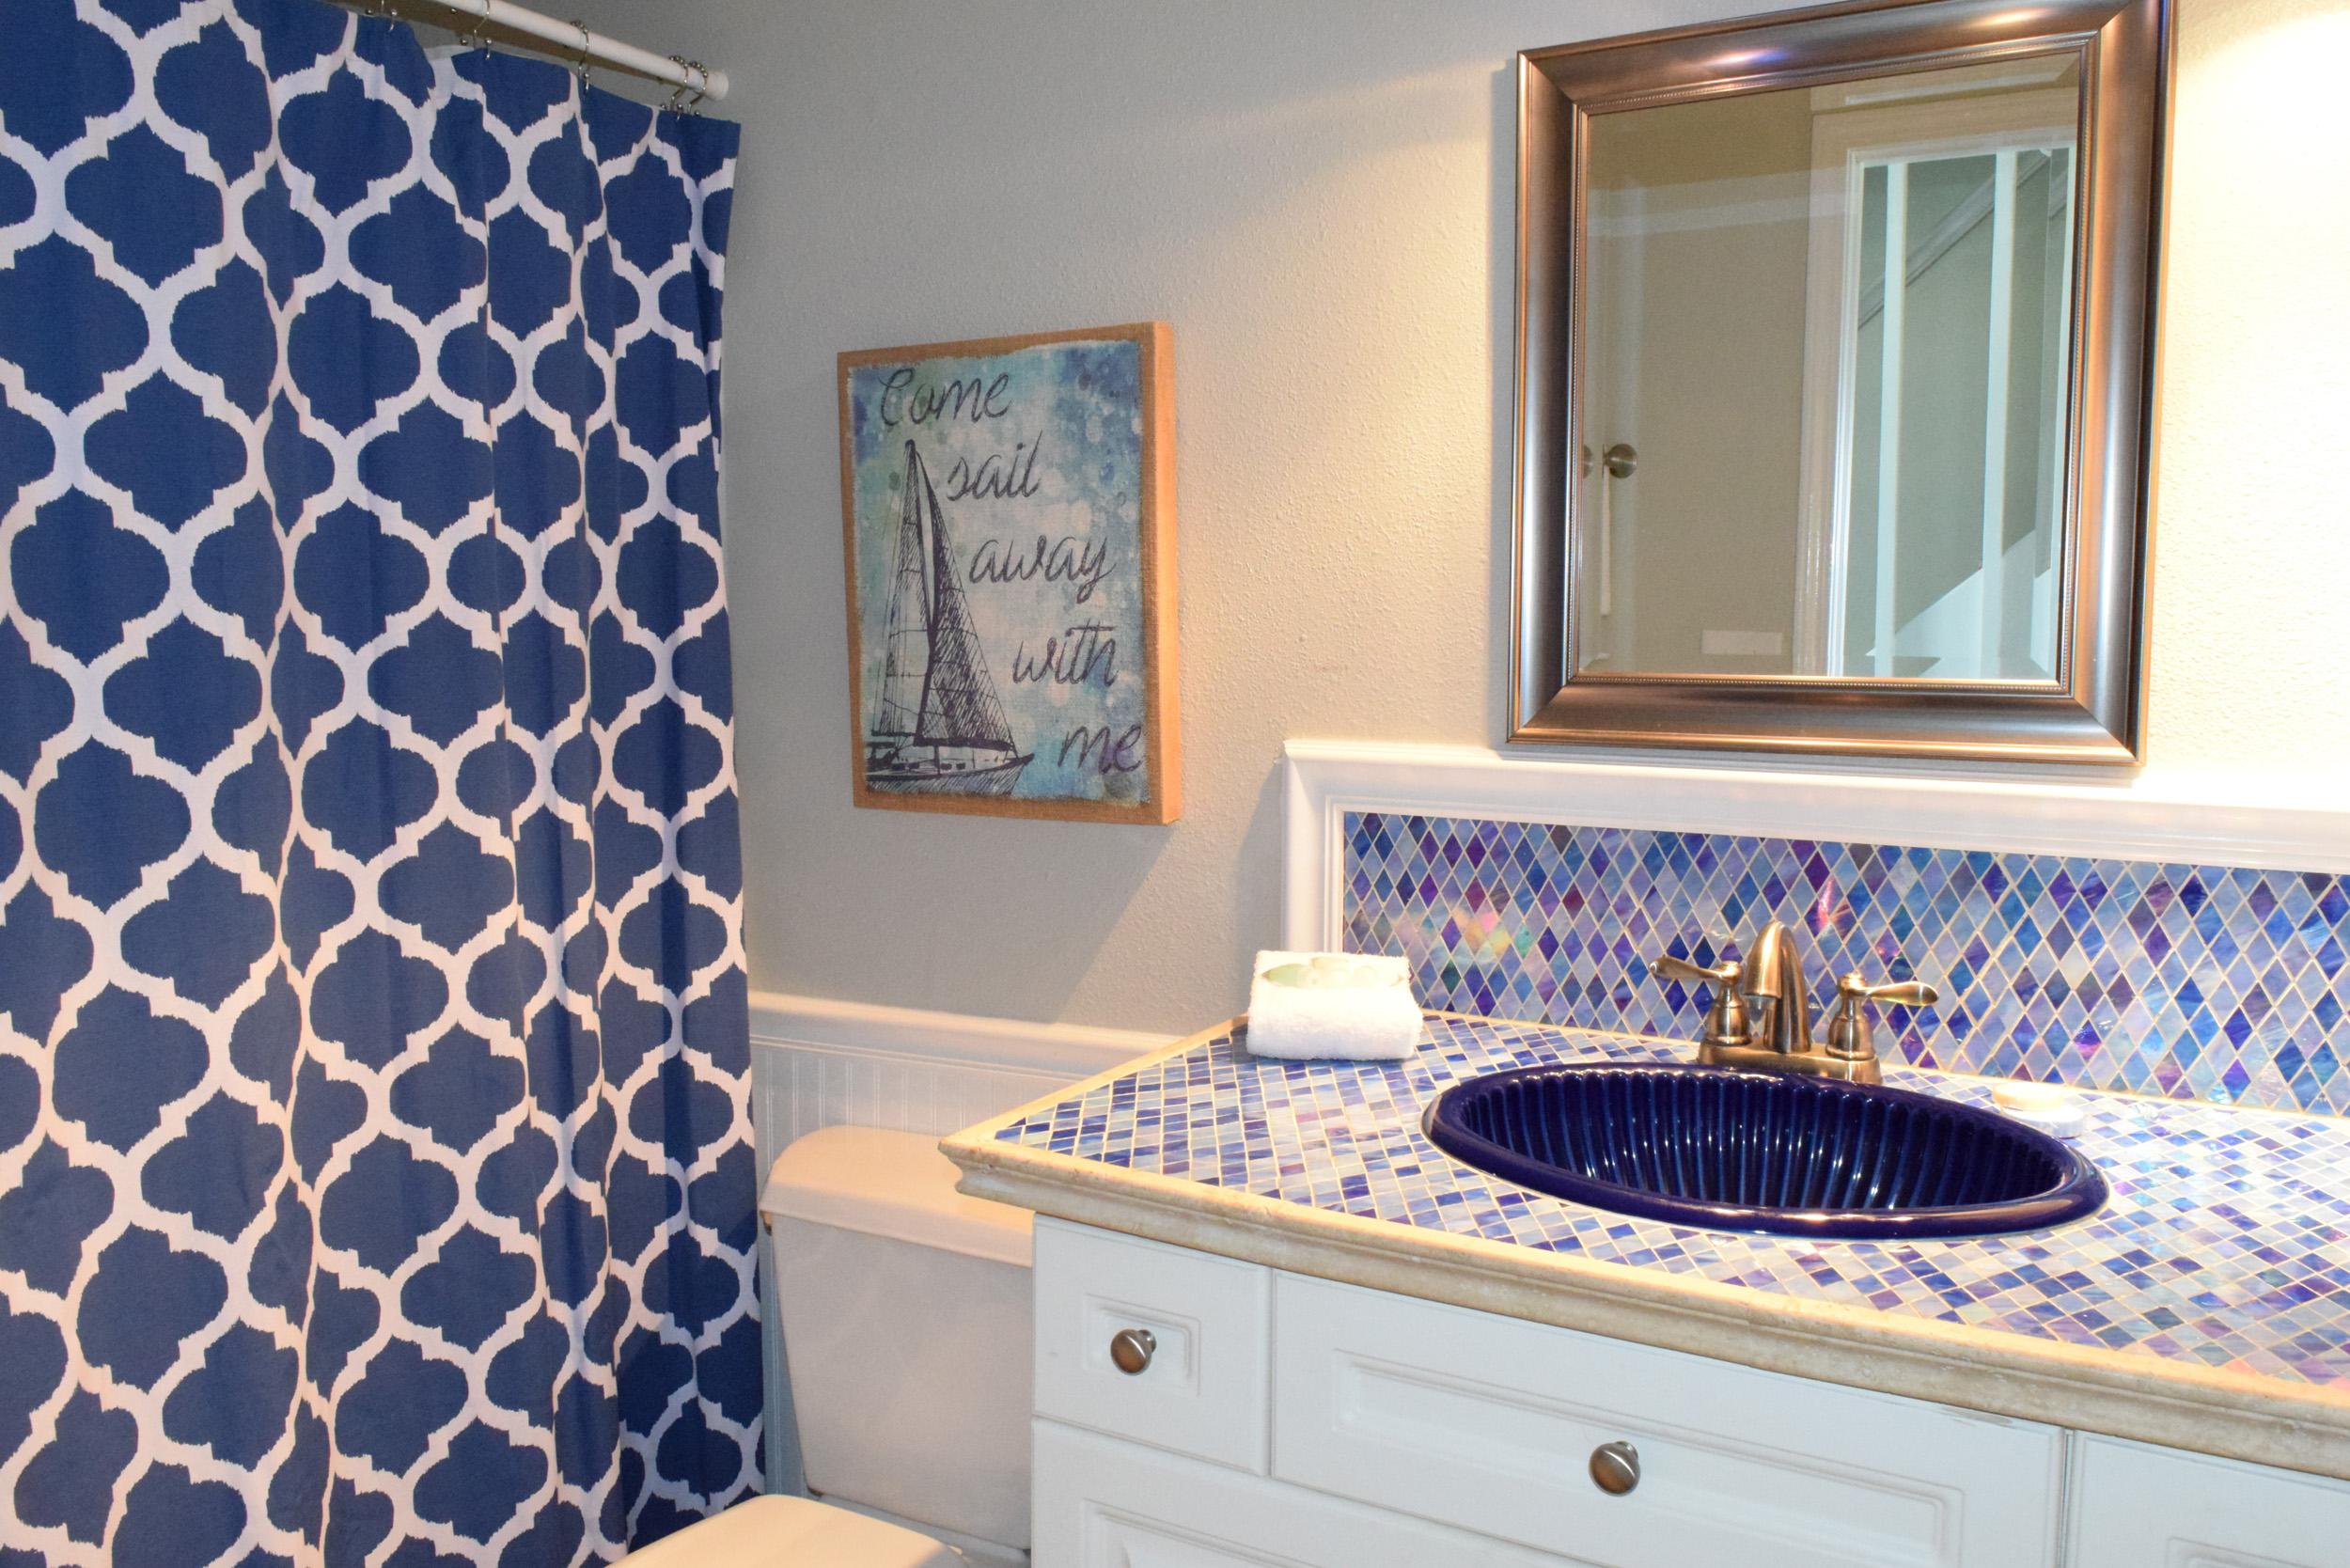 Panferio 907 House/Cottage rental in Pensacola Beach House Rentals in Pensacola Beach Florida - #25